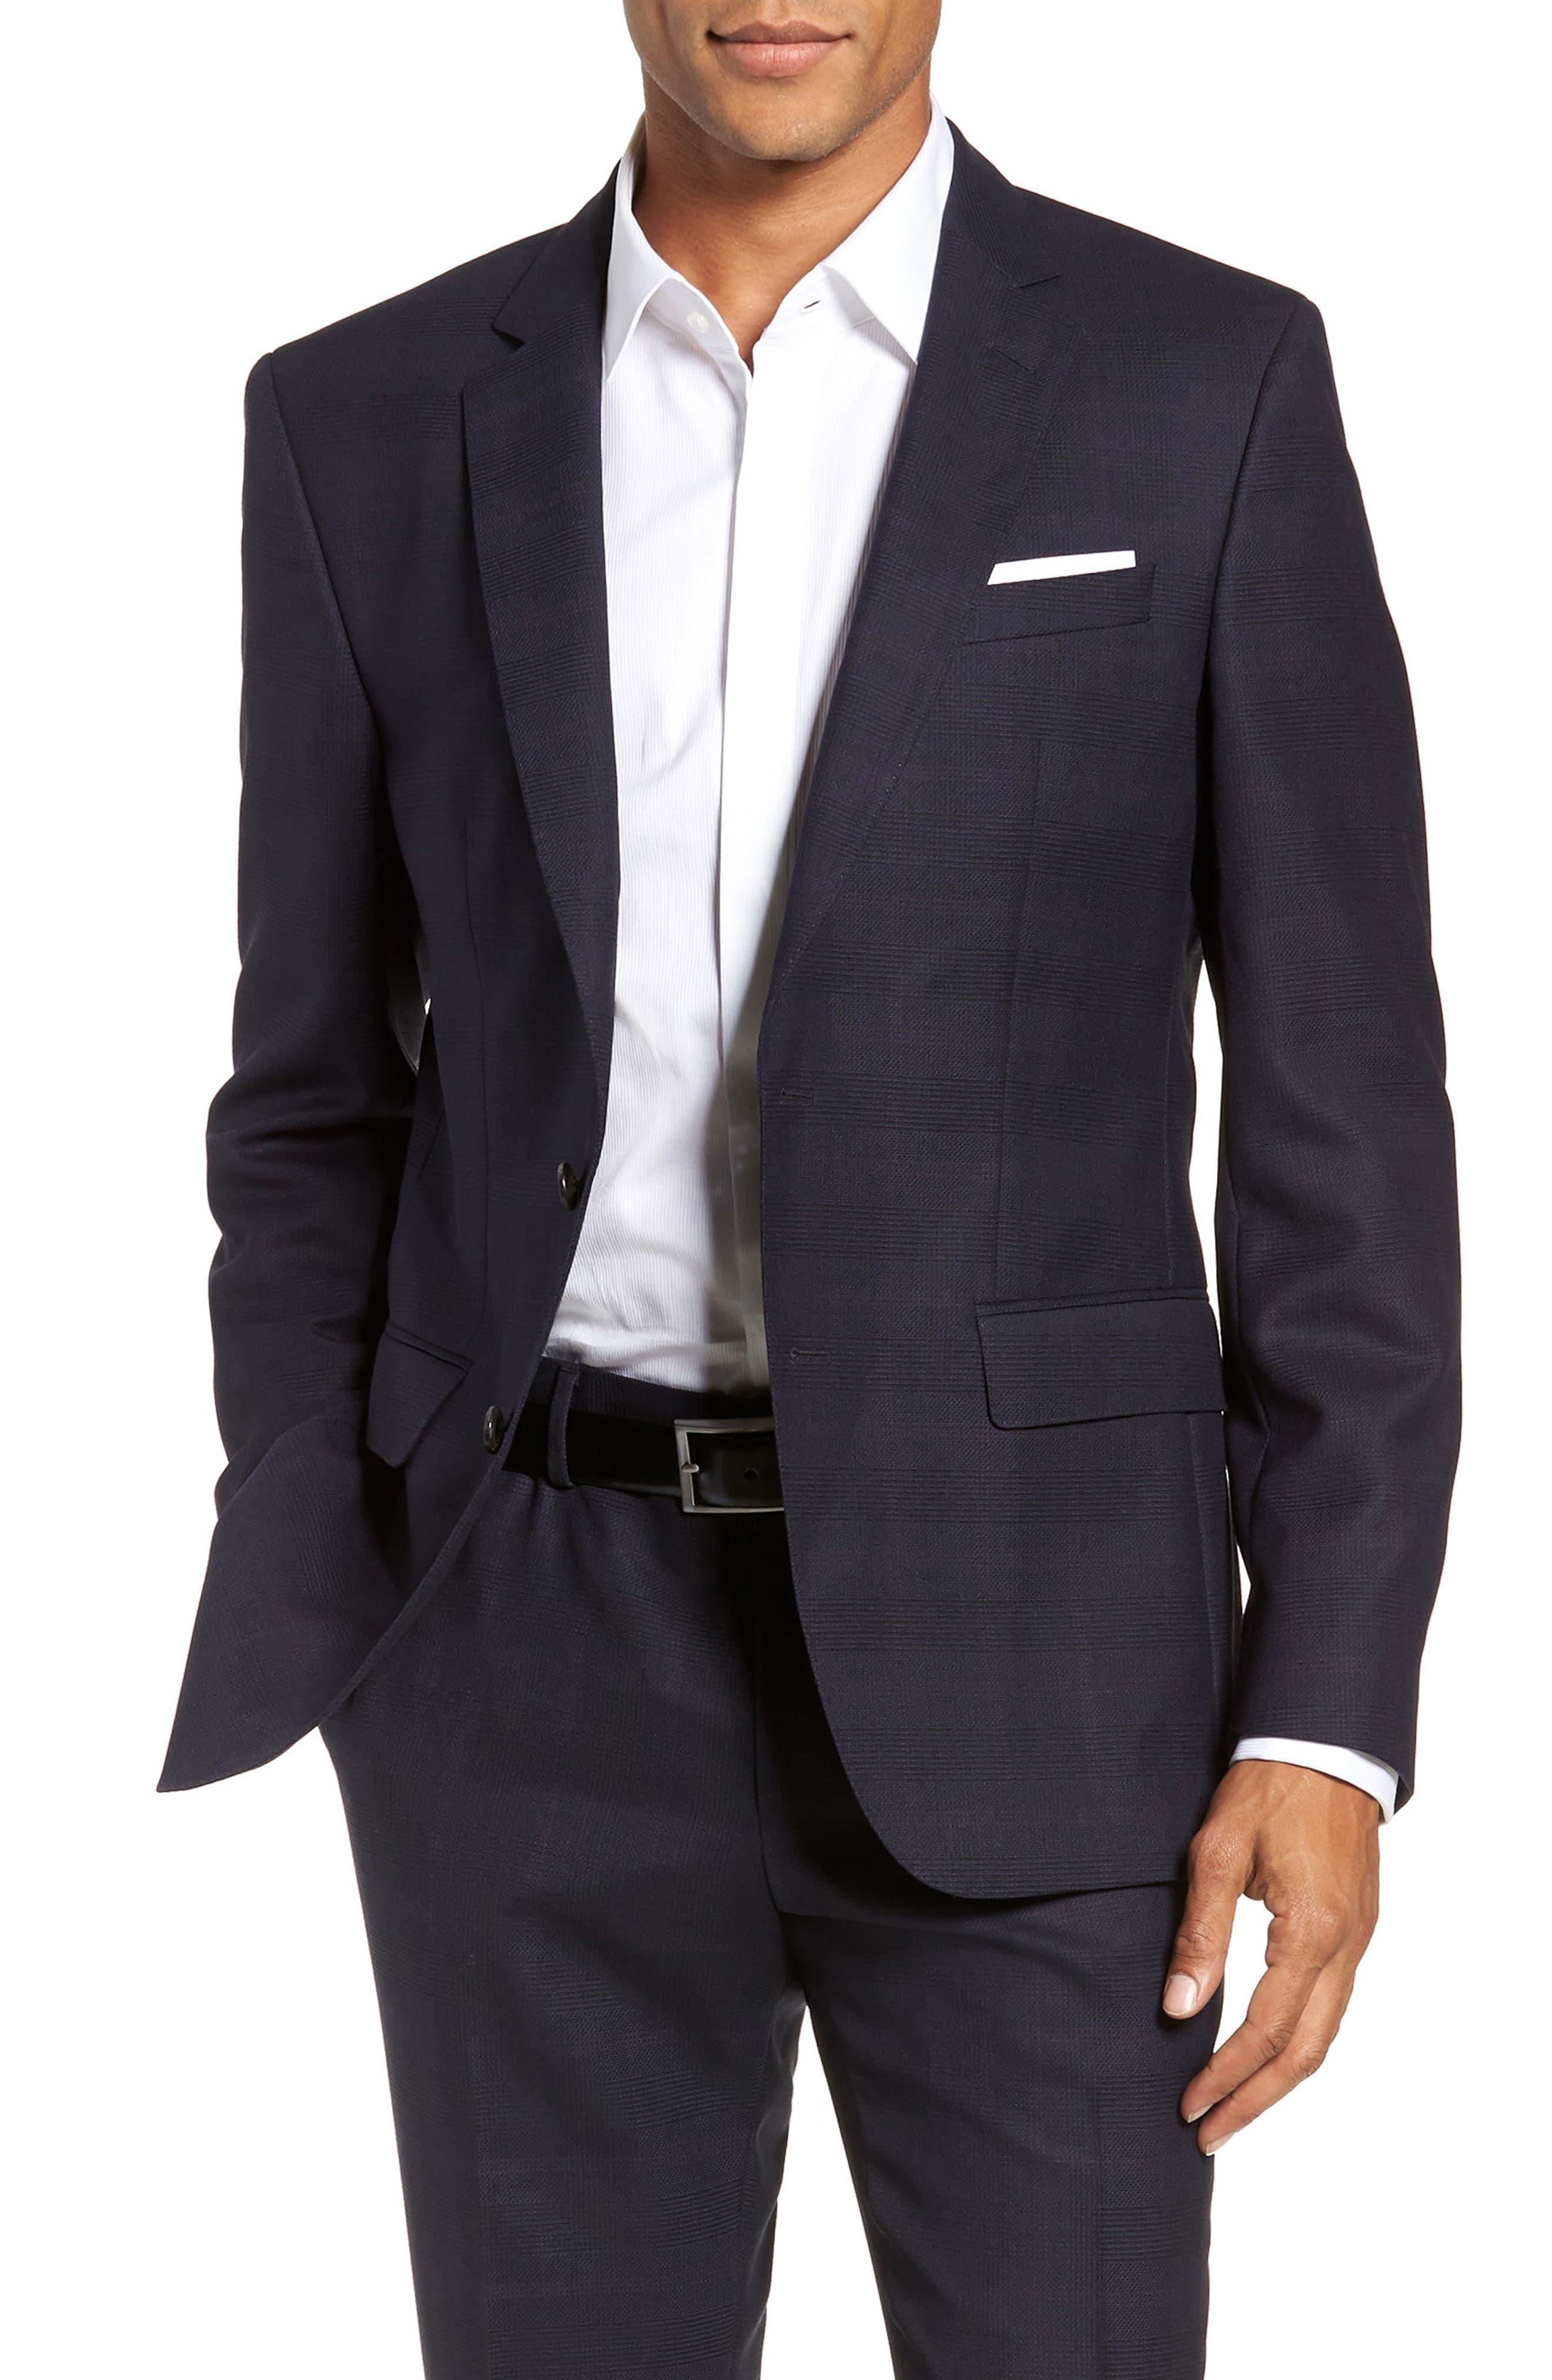 x Nordstrom Huge/Genius Trim Fit Plaid Wool Suit,                             Alternate thumbnail 6, color,                             NAVY